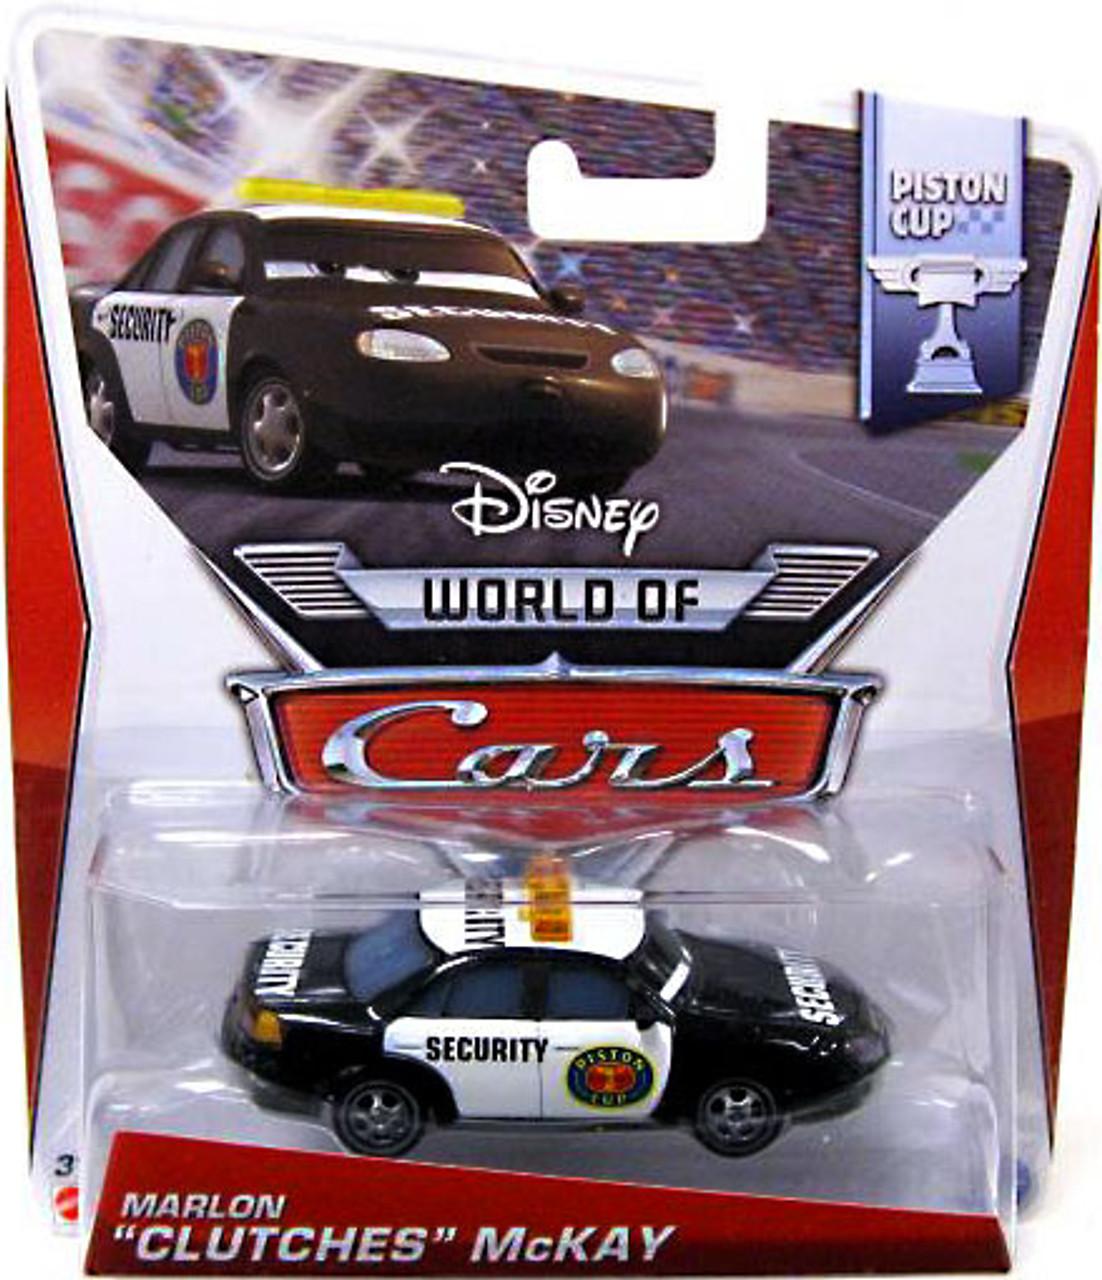 Disney / Pixar Cars The World of Cars Series 2 Marlon